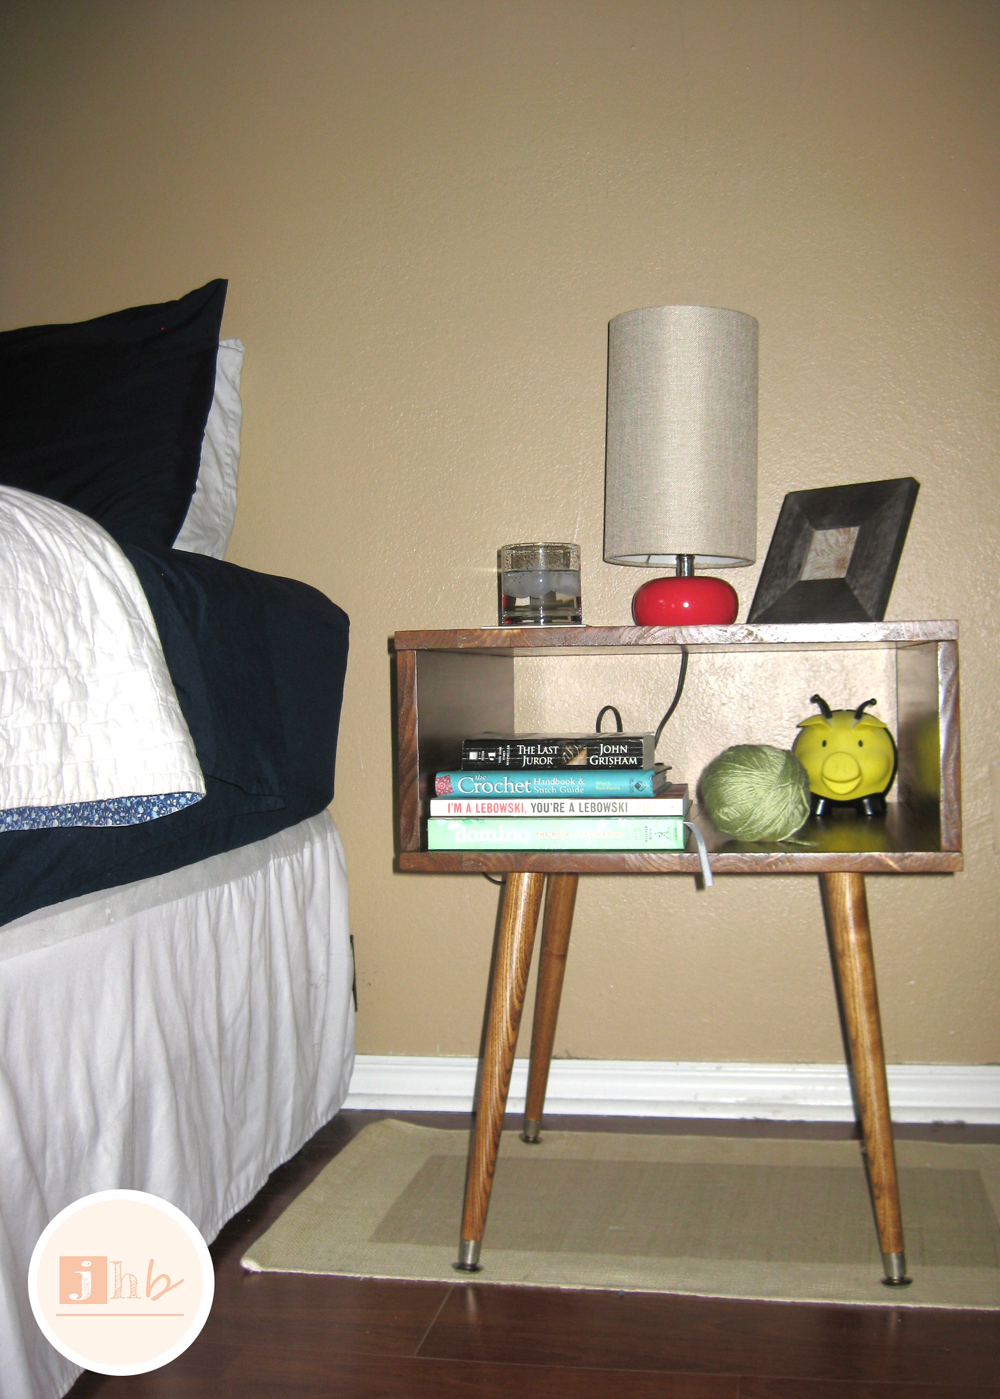 Diy mid century style nightstand jamie 39 s home blog for Diy bedroom lamp